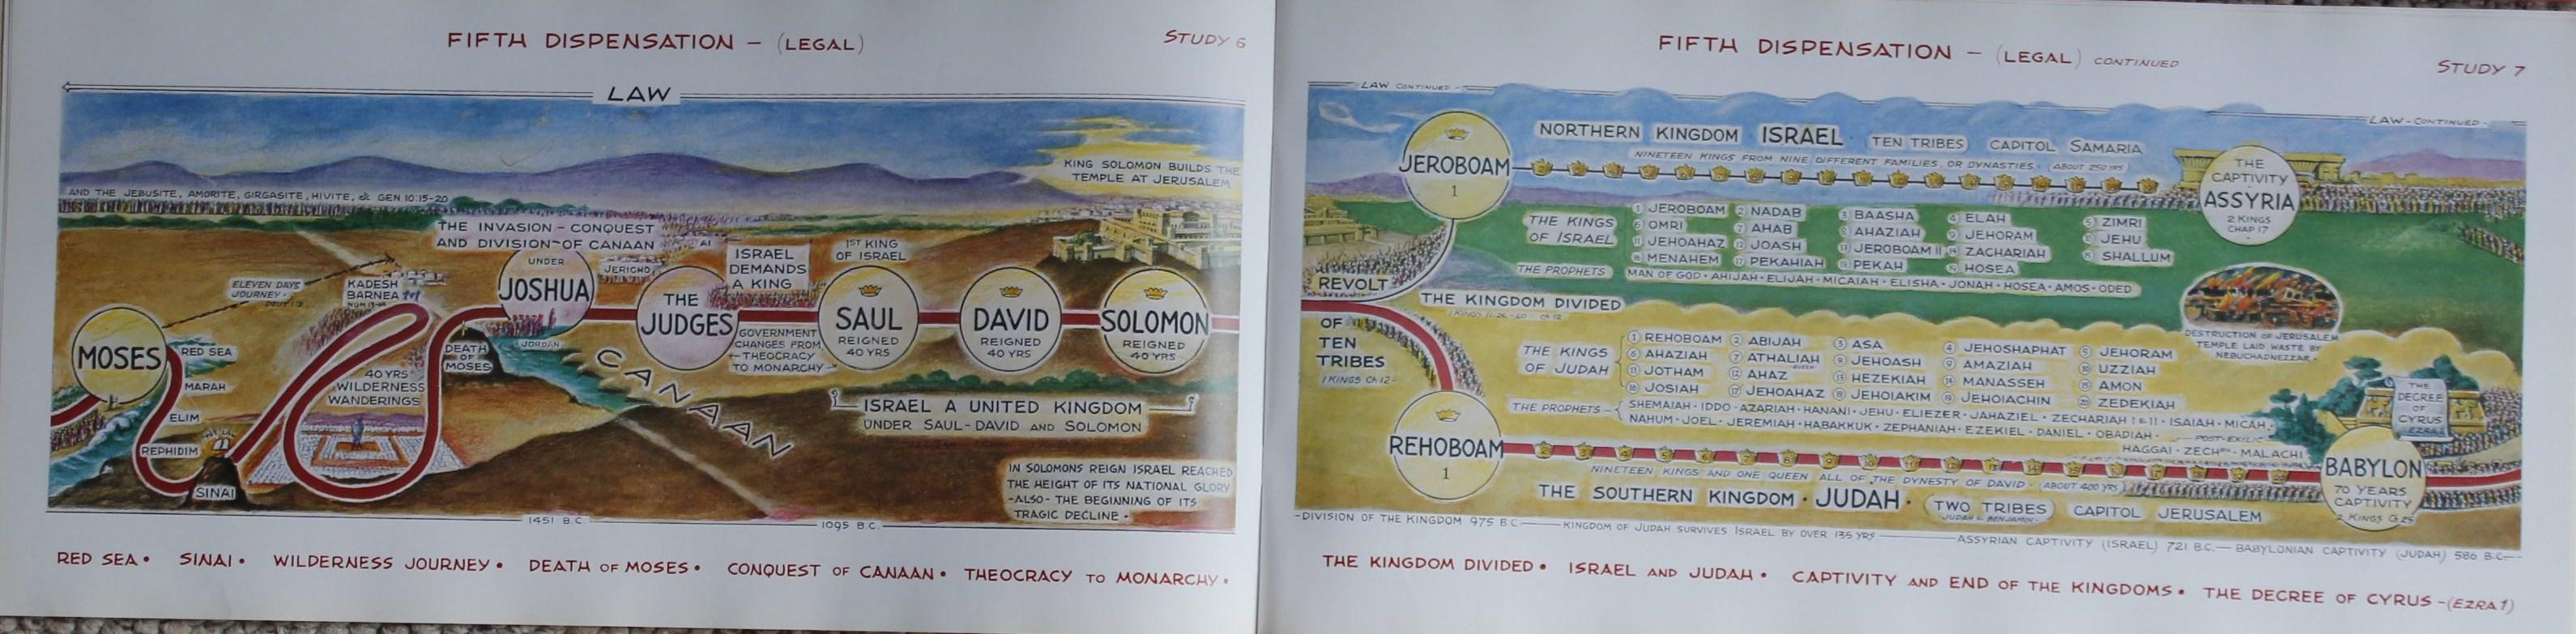 New panorama bible study course